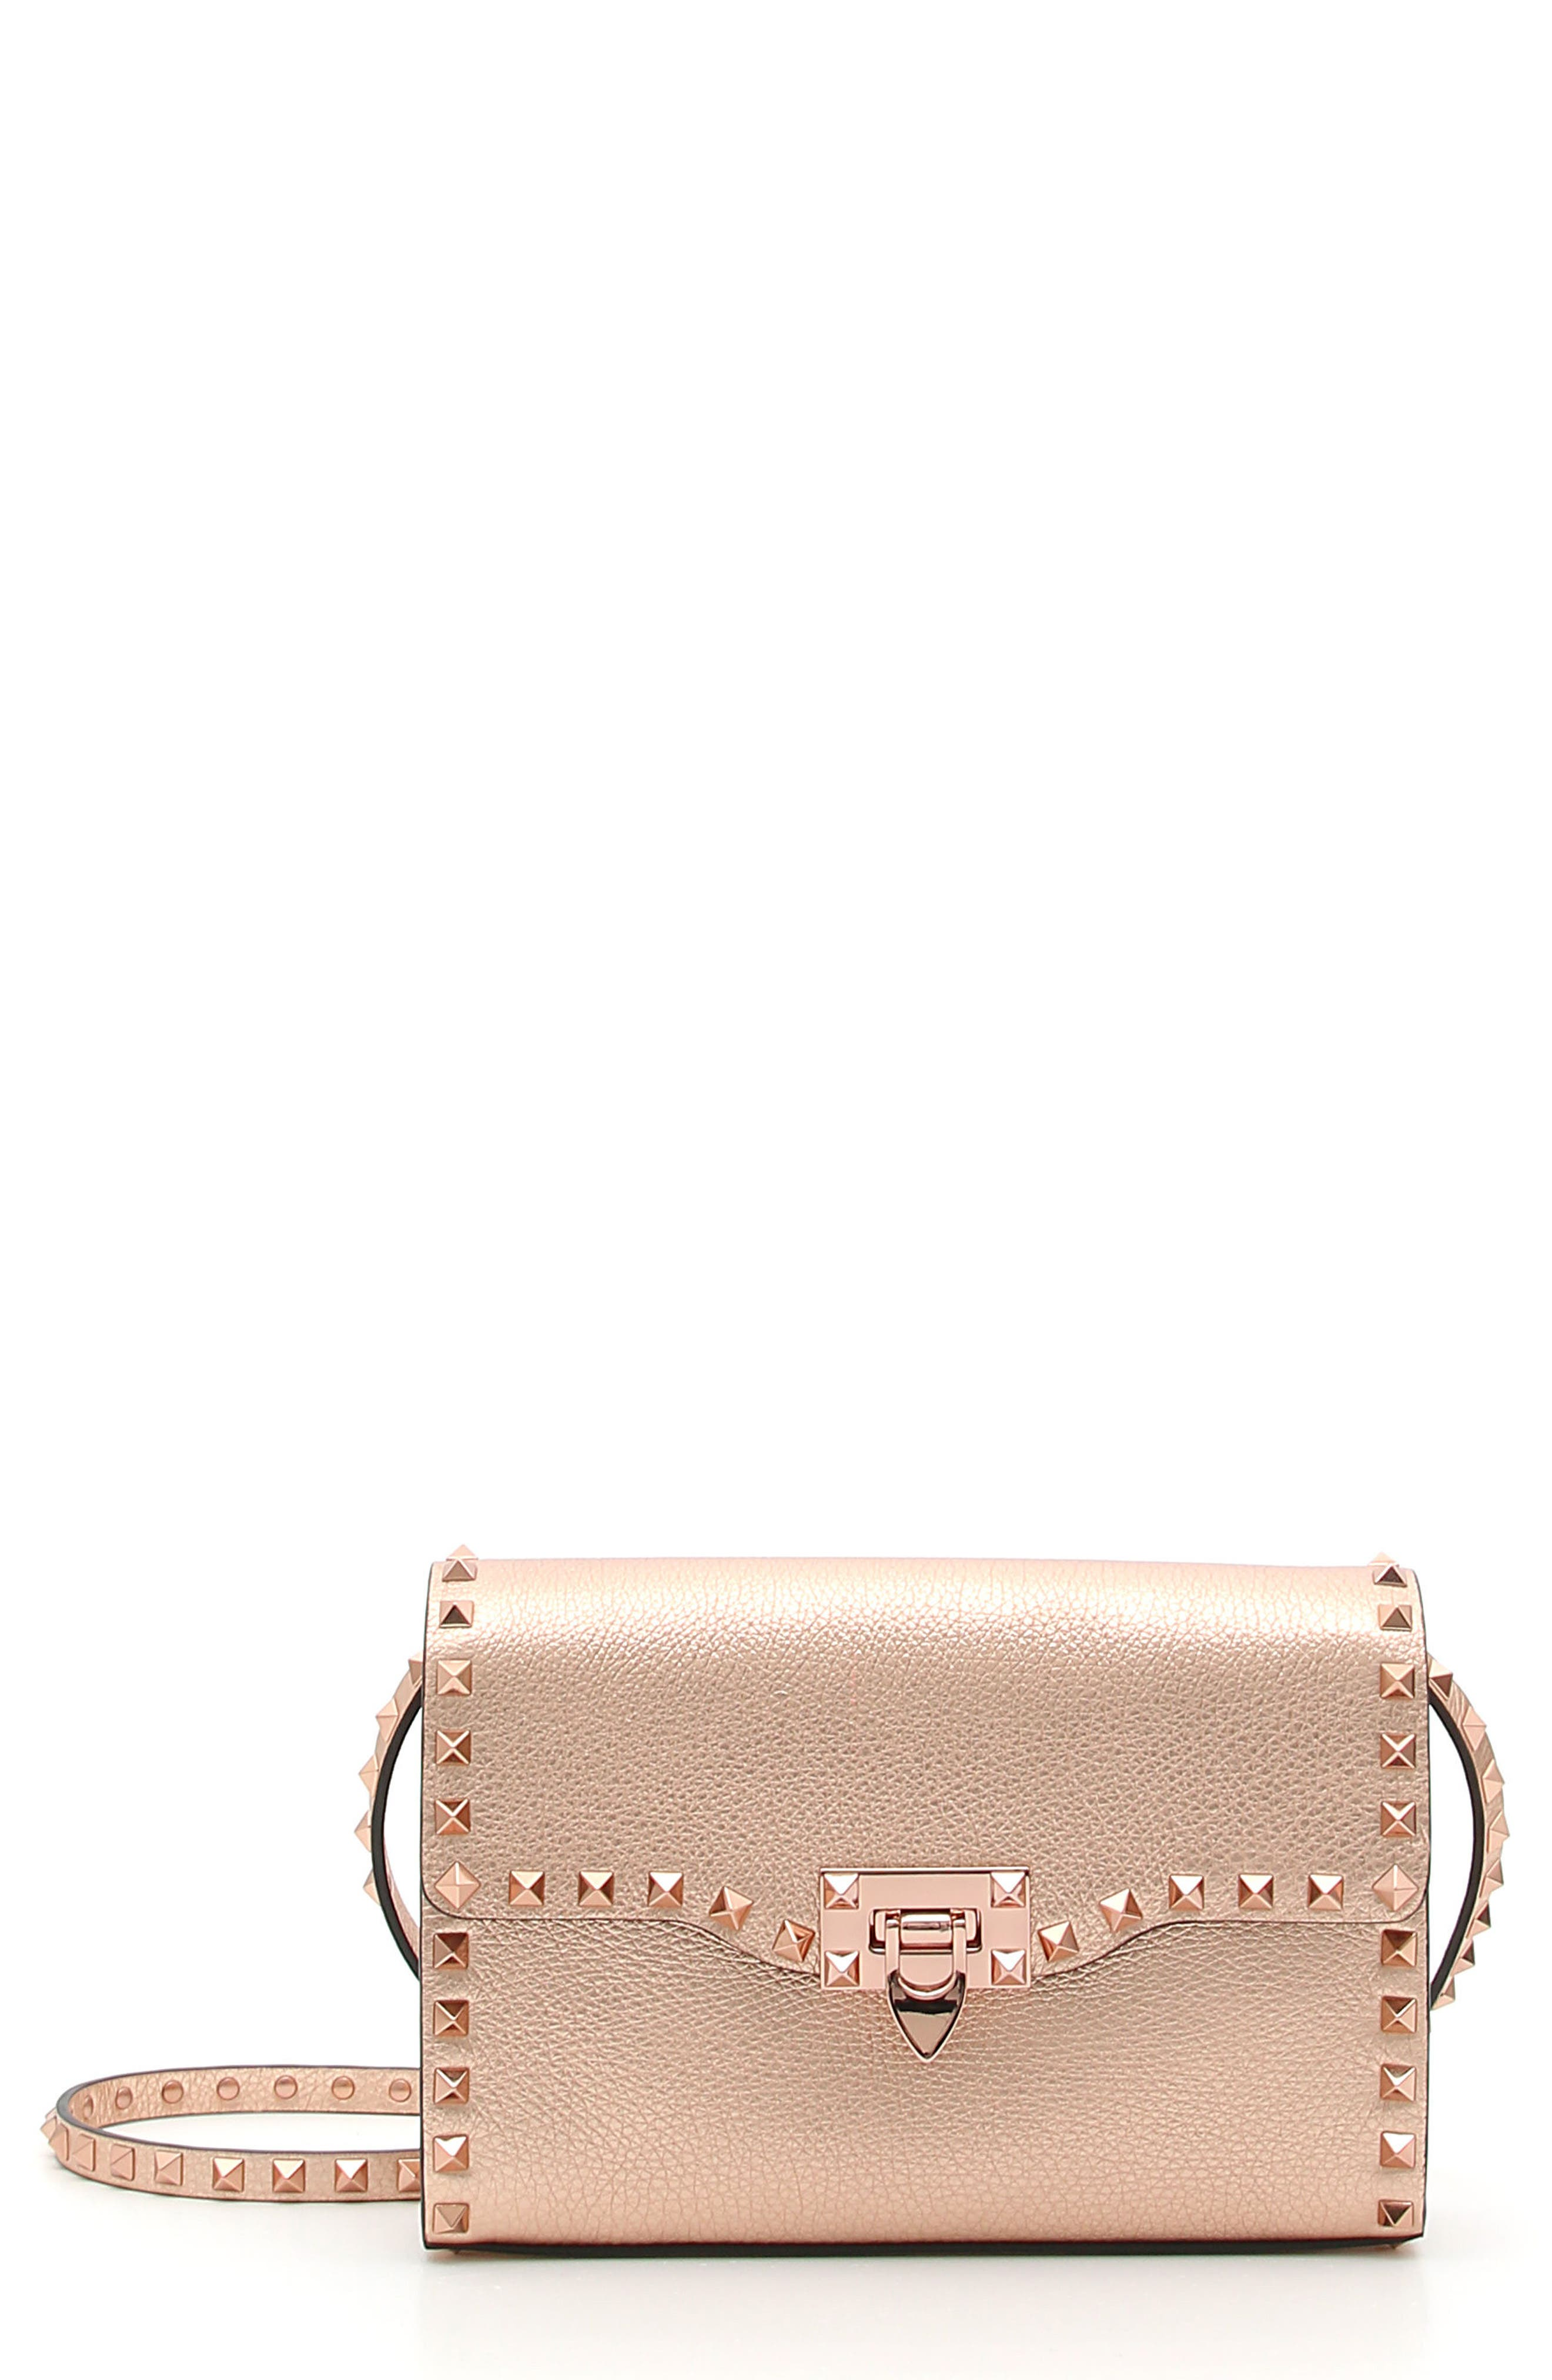 Rockstud Medium Metallic Leather Shoulder Bag,                         Main,                         color, 682